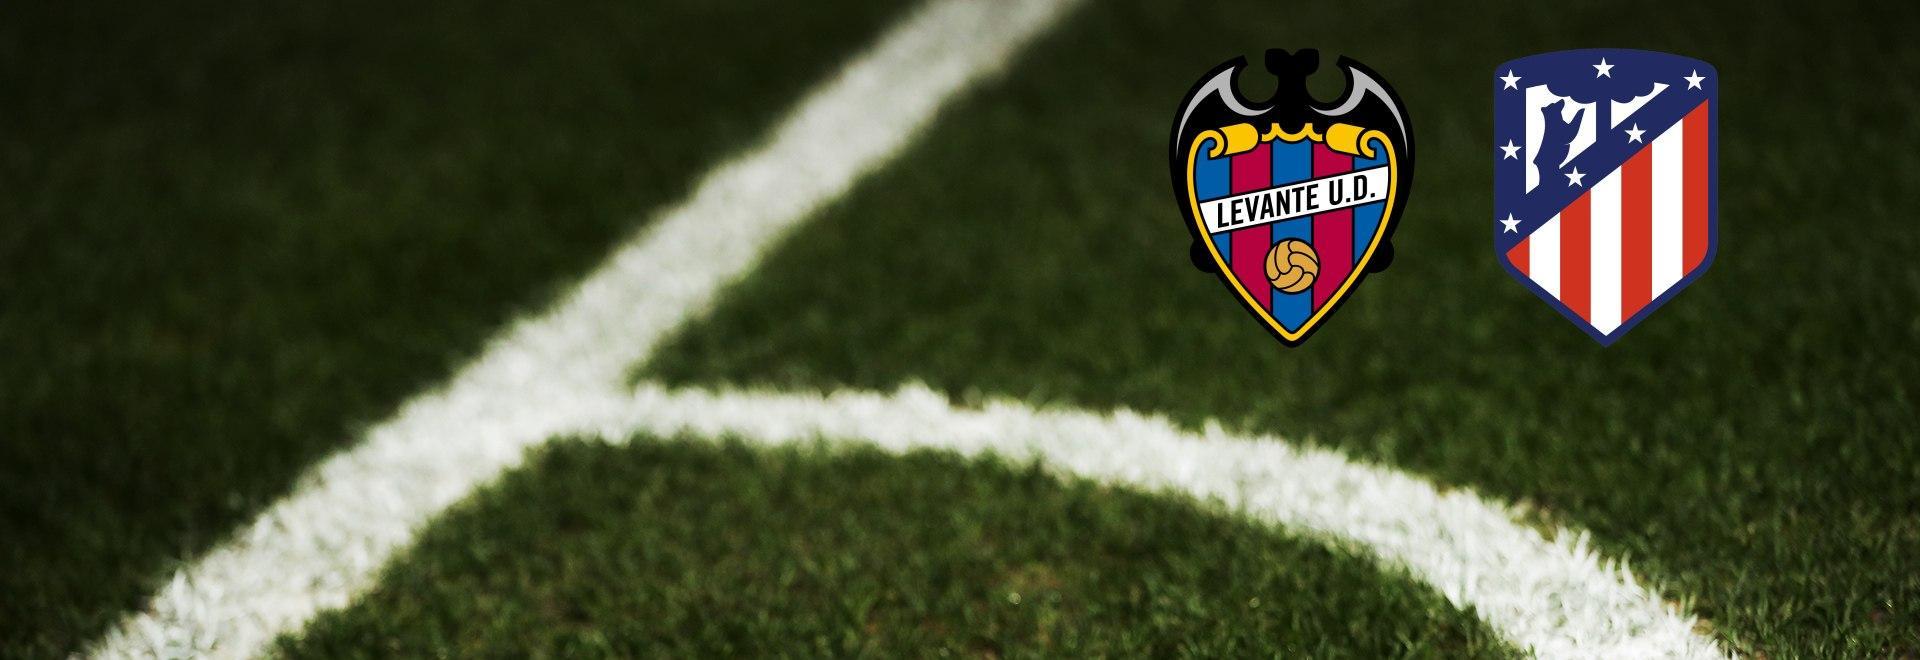 Levante - Atlético Madrid. 2a g.